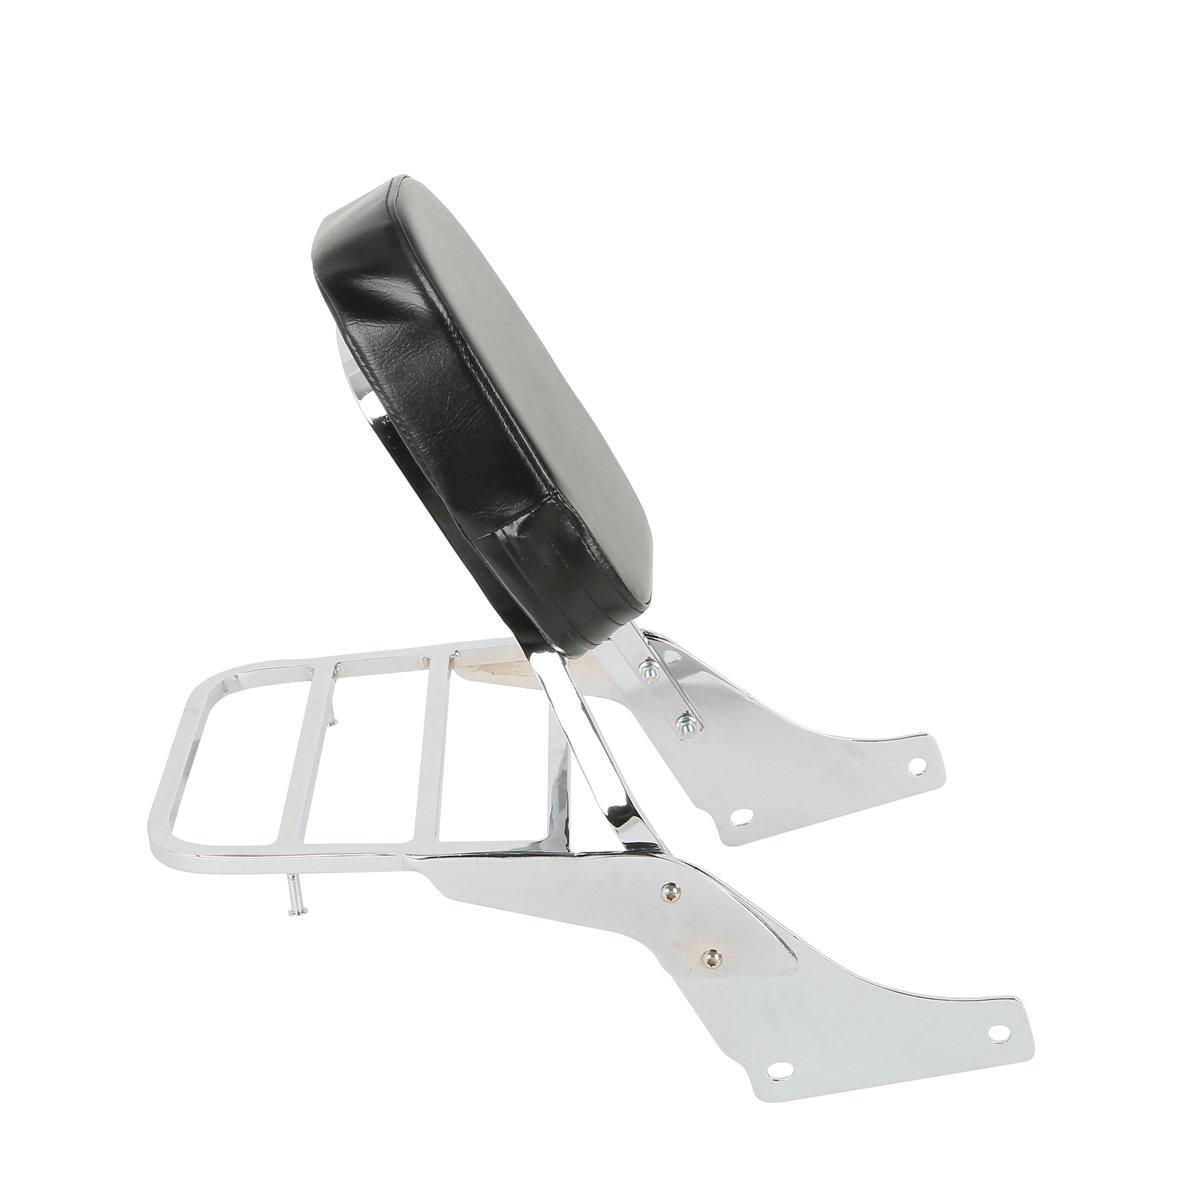 XFMT Backrest Detachable Sissy Bar W/Luggage Rack Backrest For Honda Shadow SABRE VT1100 ACE VT1100 All Years